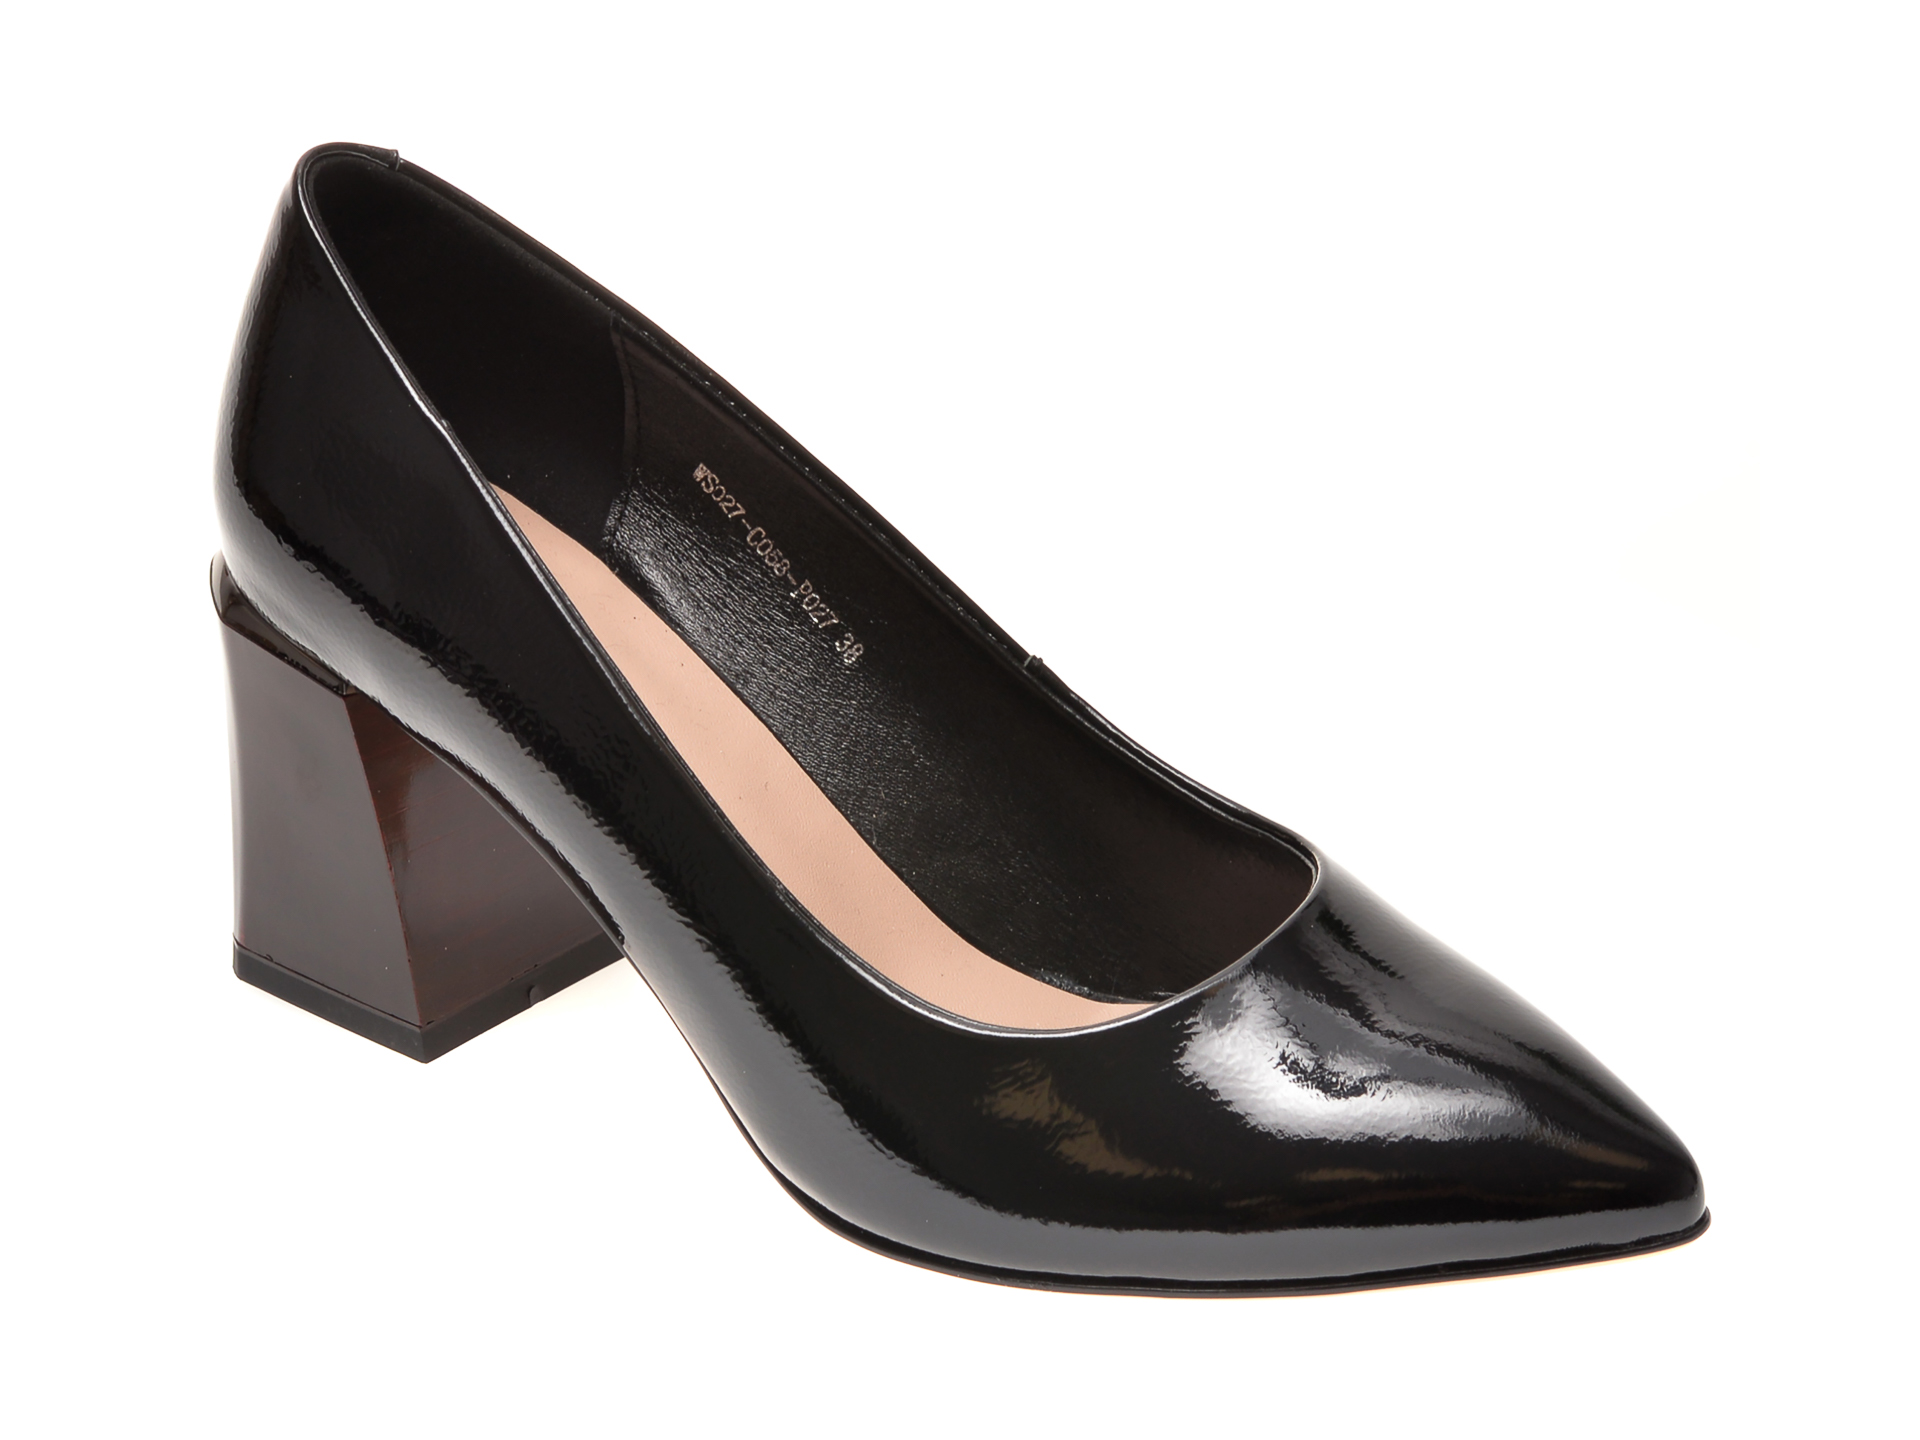 Pantofi FLAVIA PASSINI negri, WS02C05, din piele naturala lacuita imagine otter.ro 2021